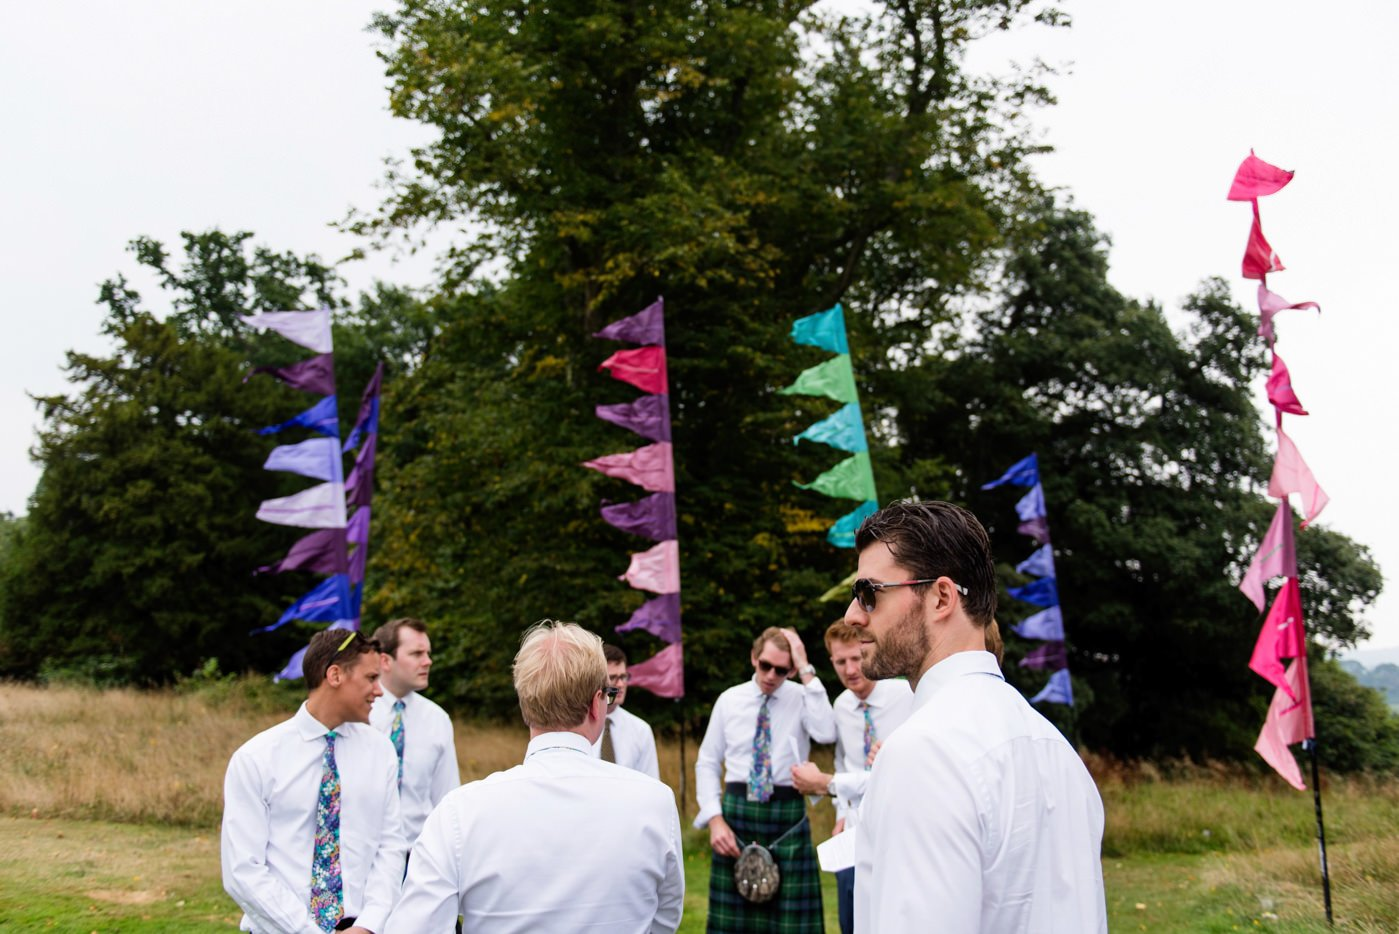 bignor-park-wedding-photography-robyn-and-tom-36